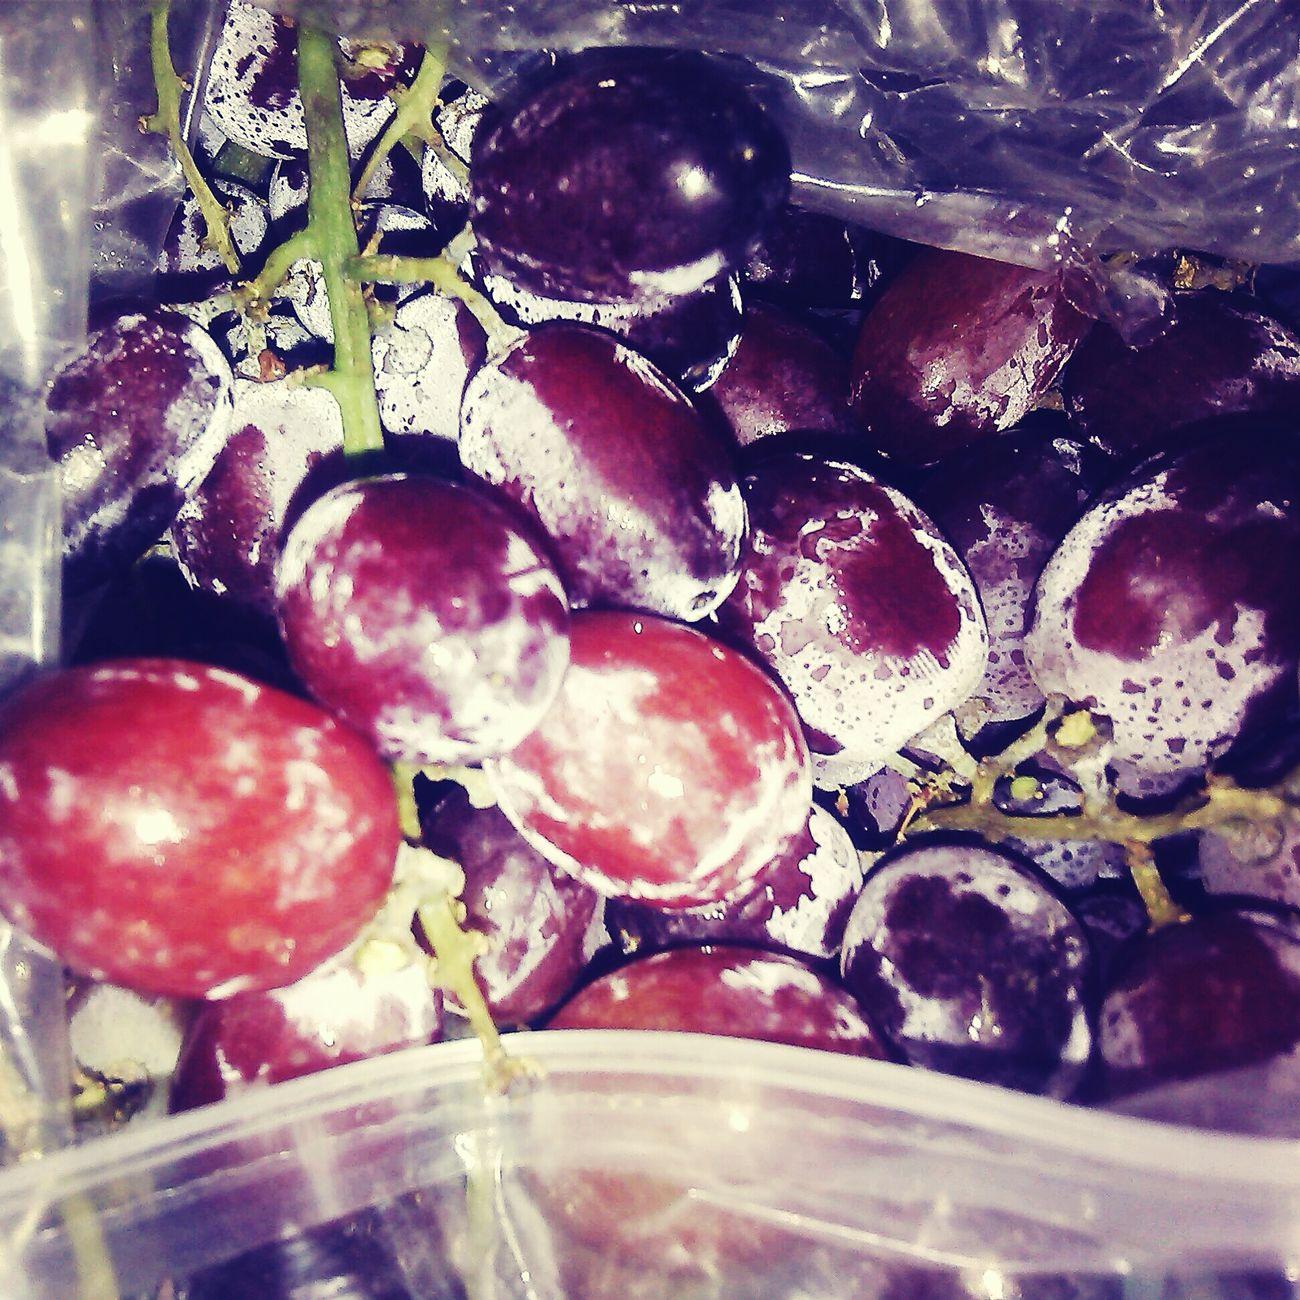 Grapes. Vscom Ilovefood Fresh Fruits